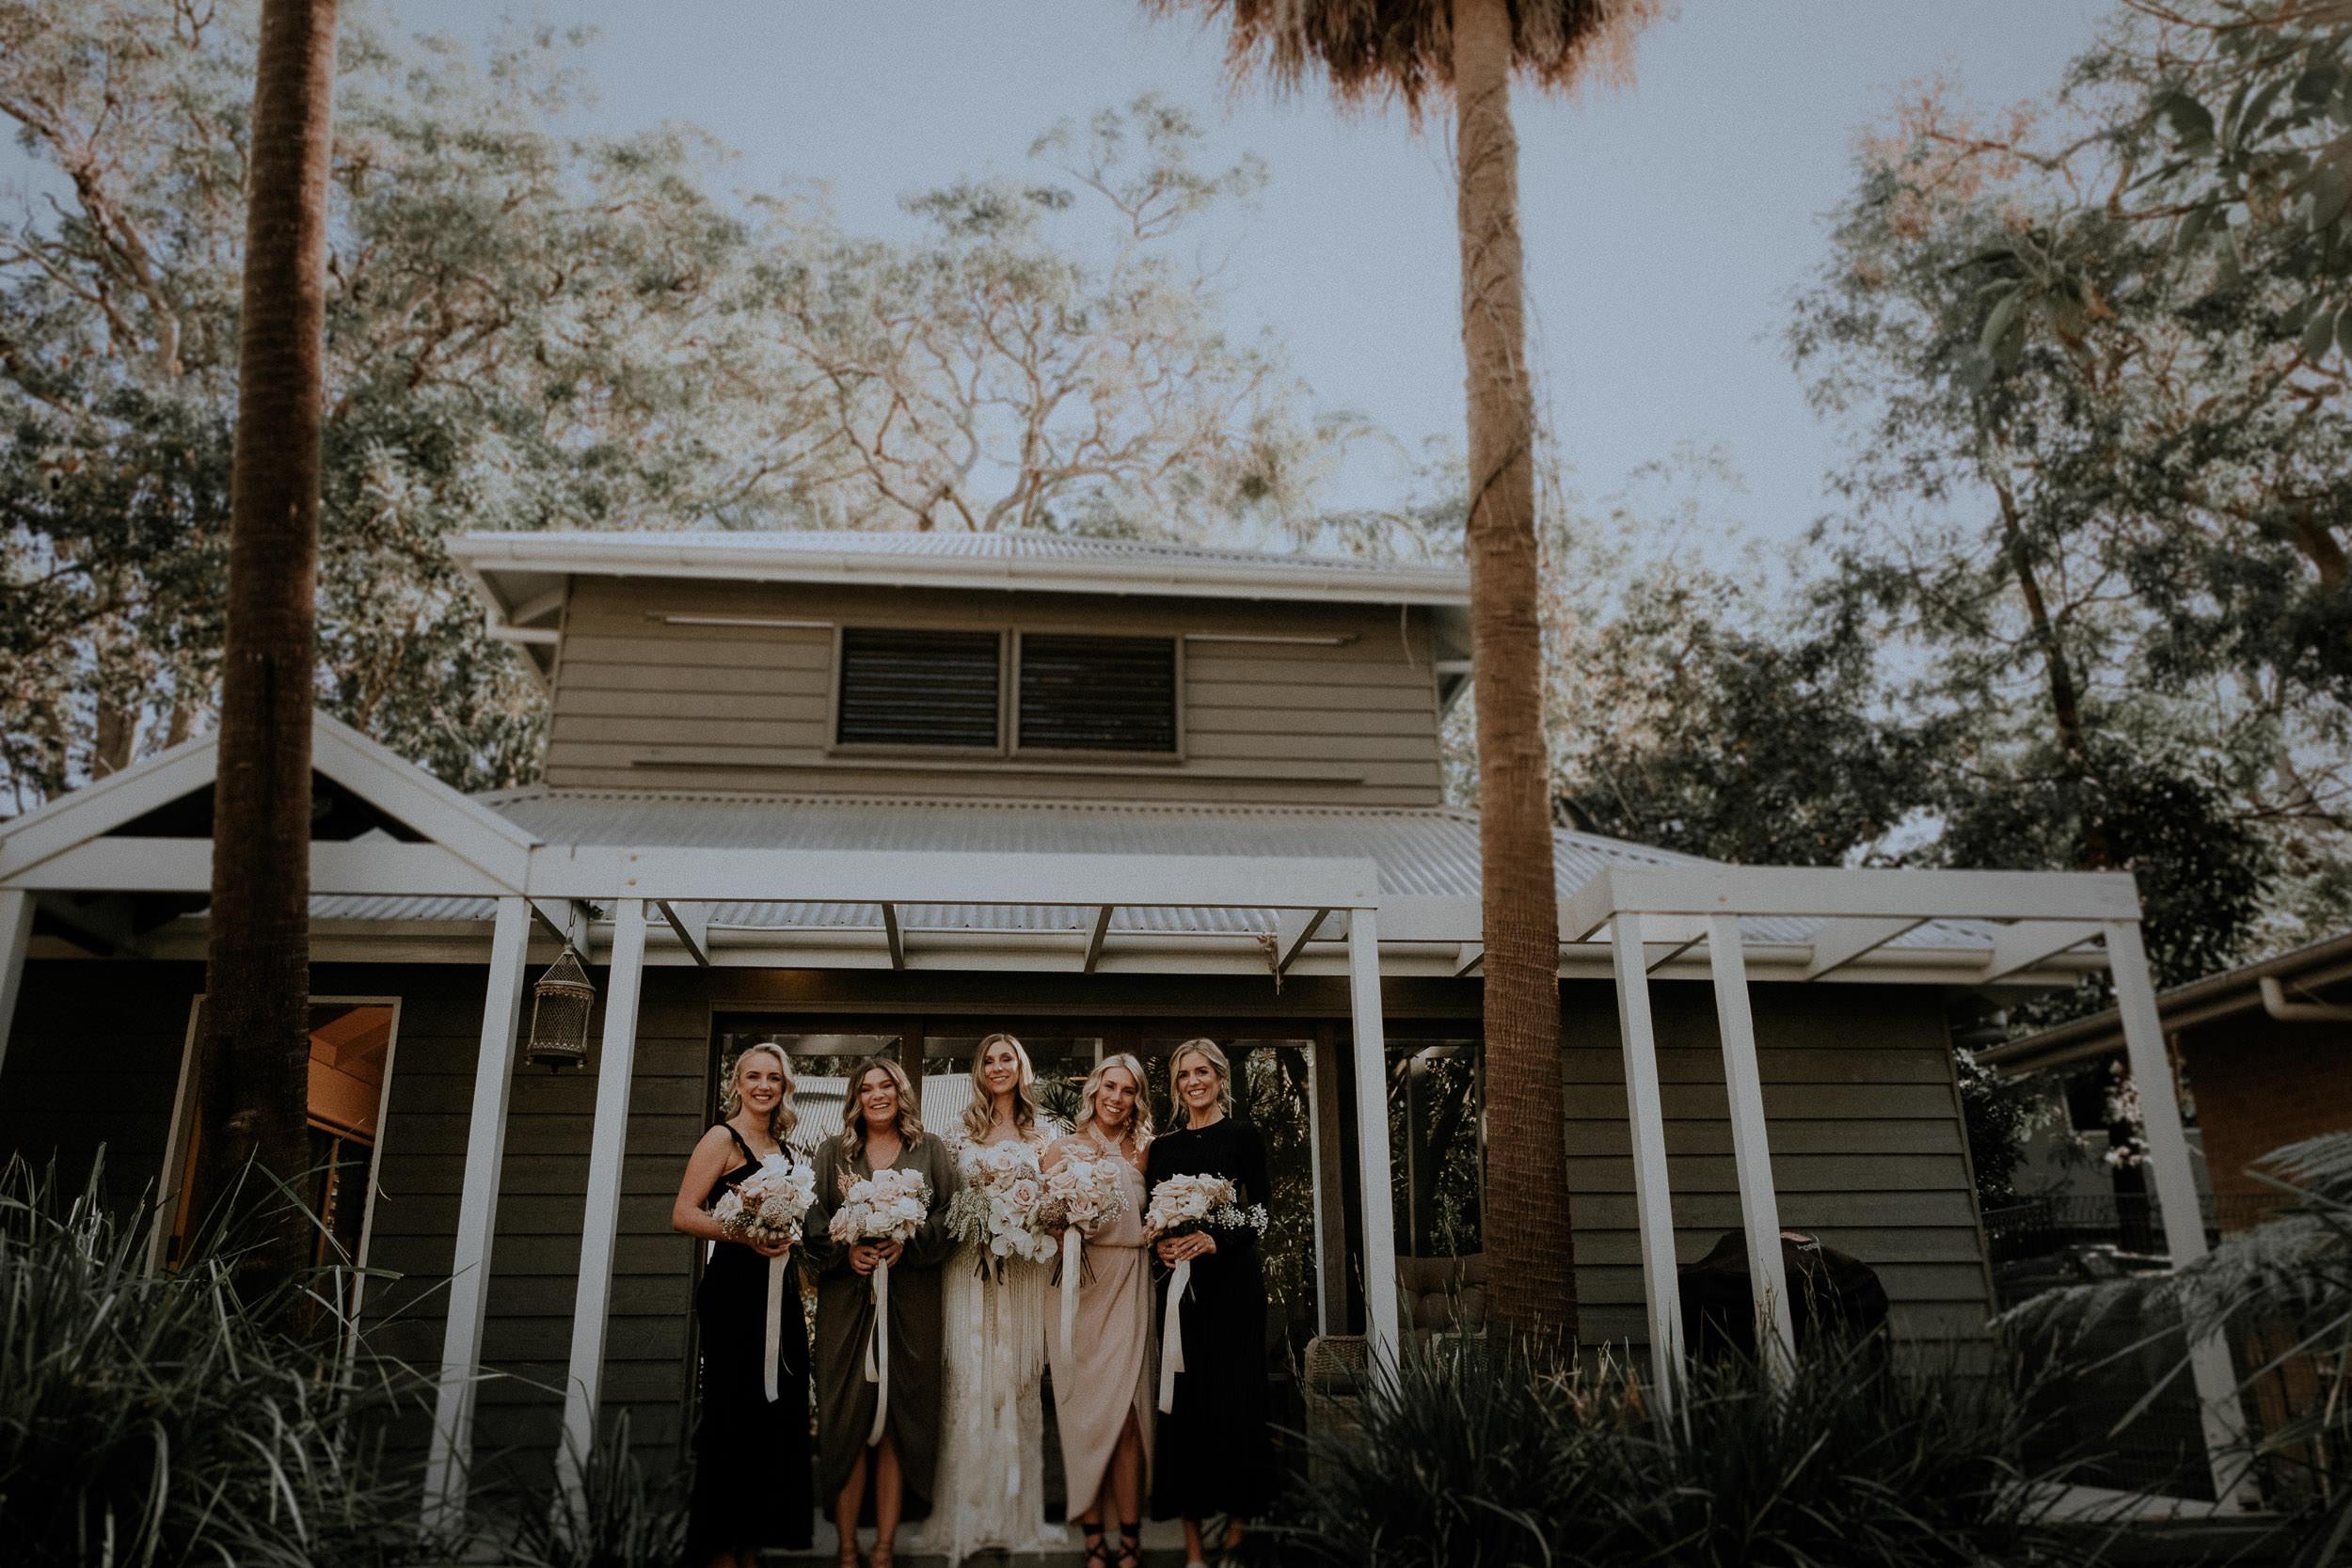 S&A Elopement - Kings & Thieves - Shred 'Til Dead - Central Coast Beach Forest Wedding - 119.jpg